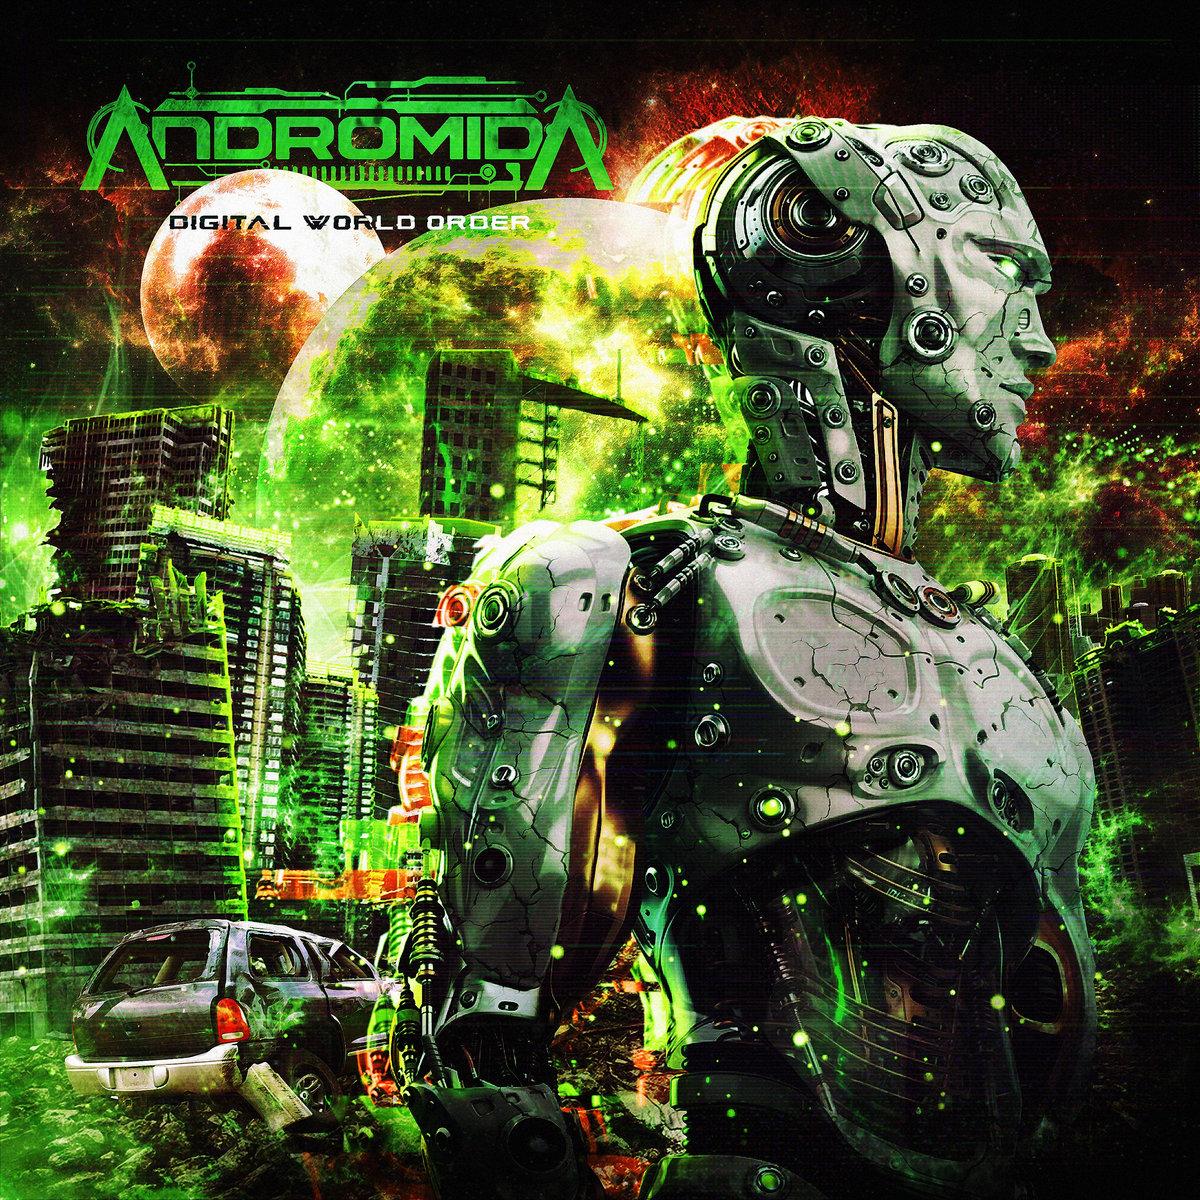 Digital World Order by Andromida